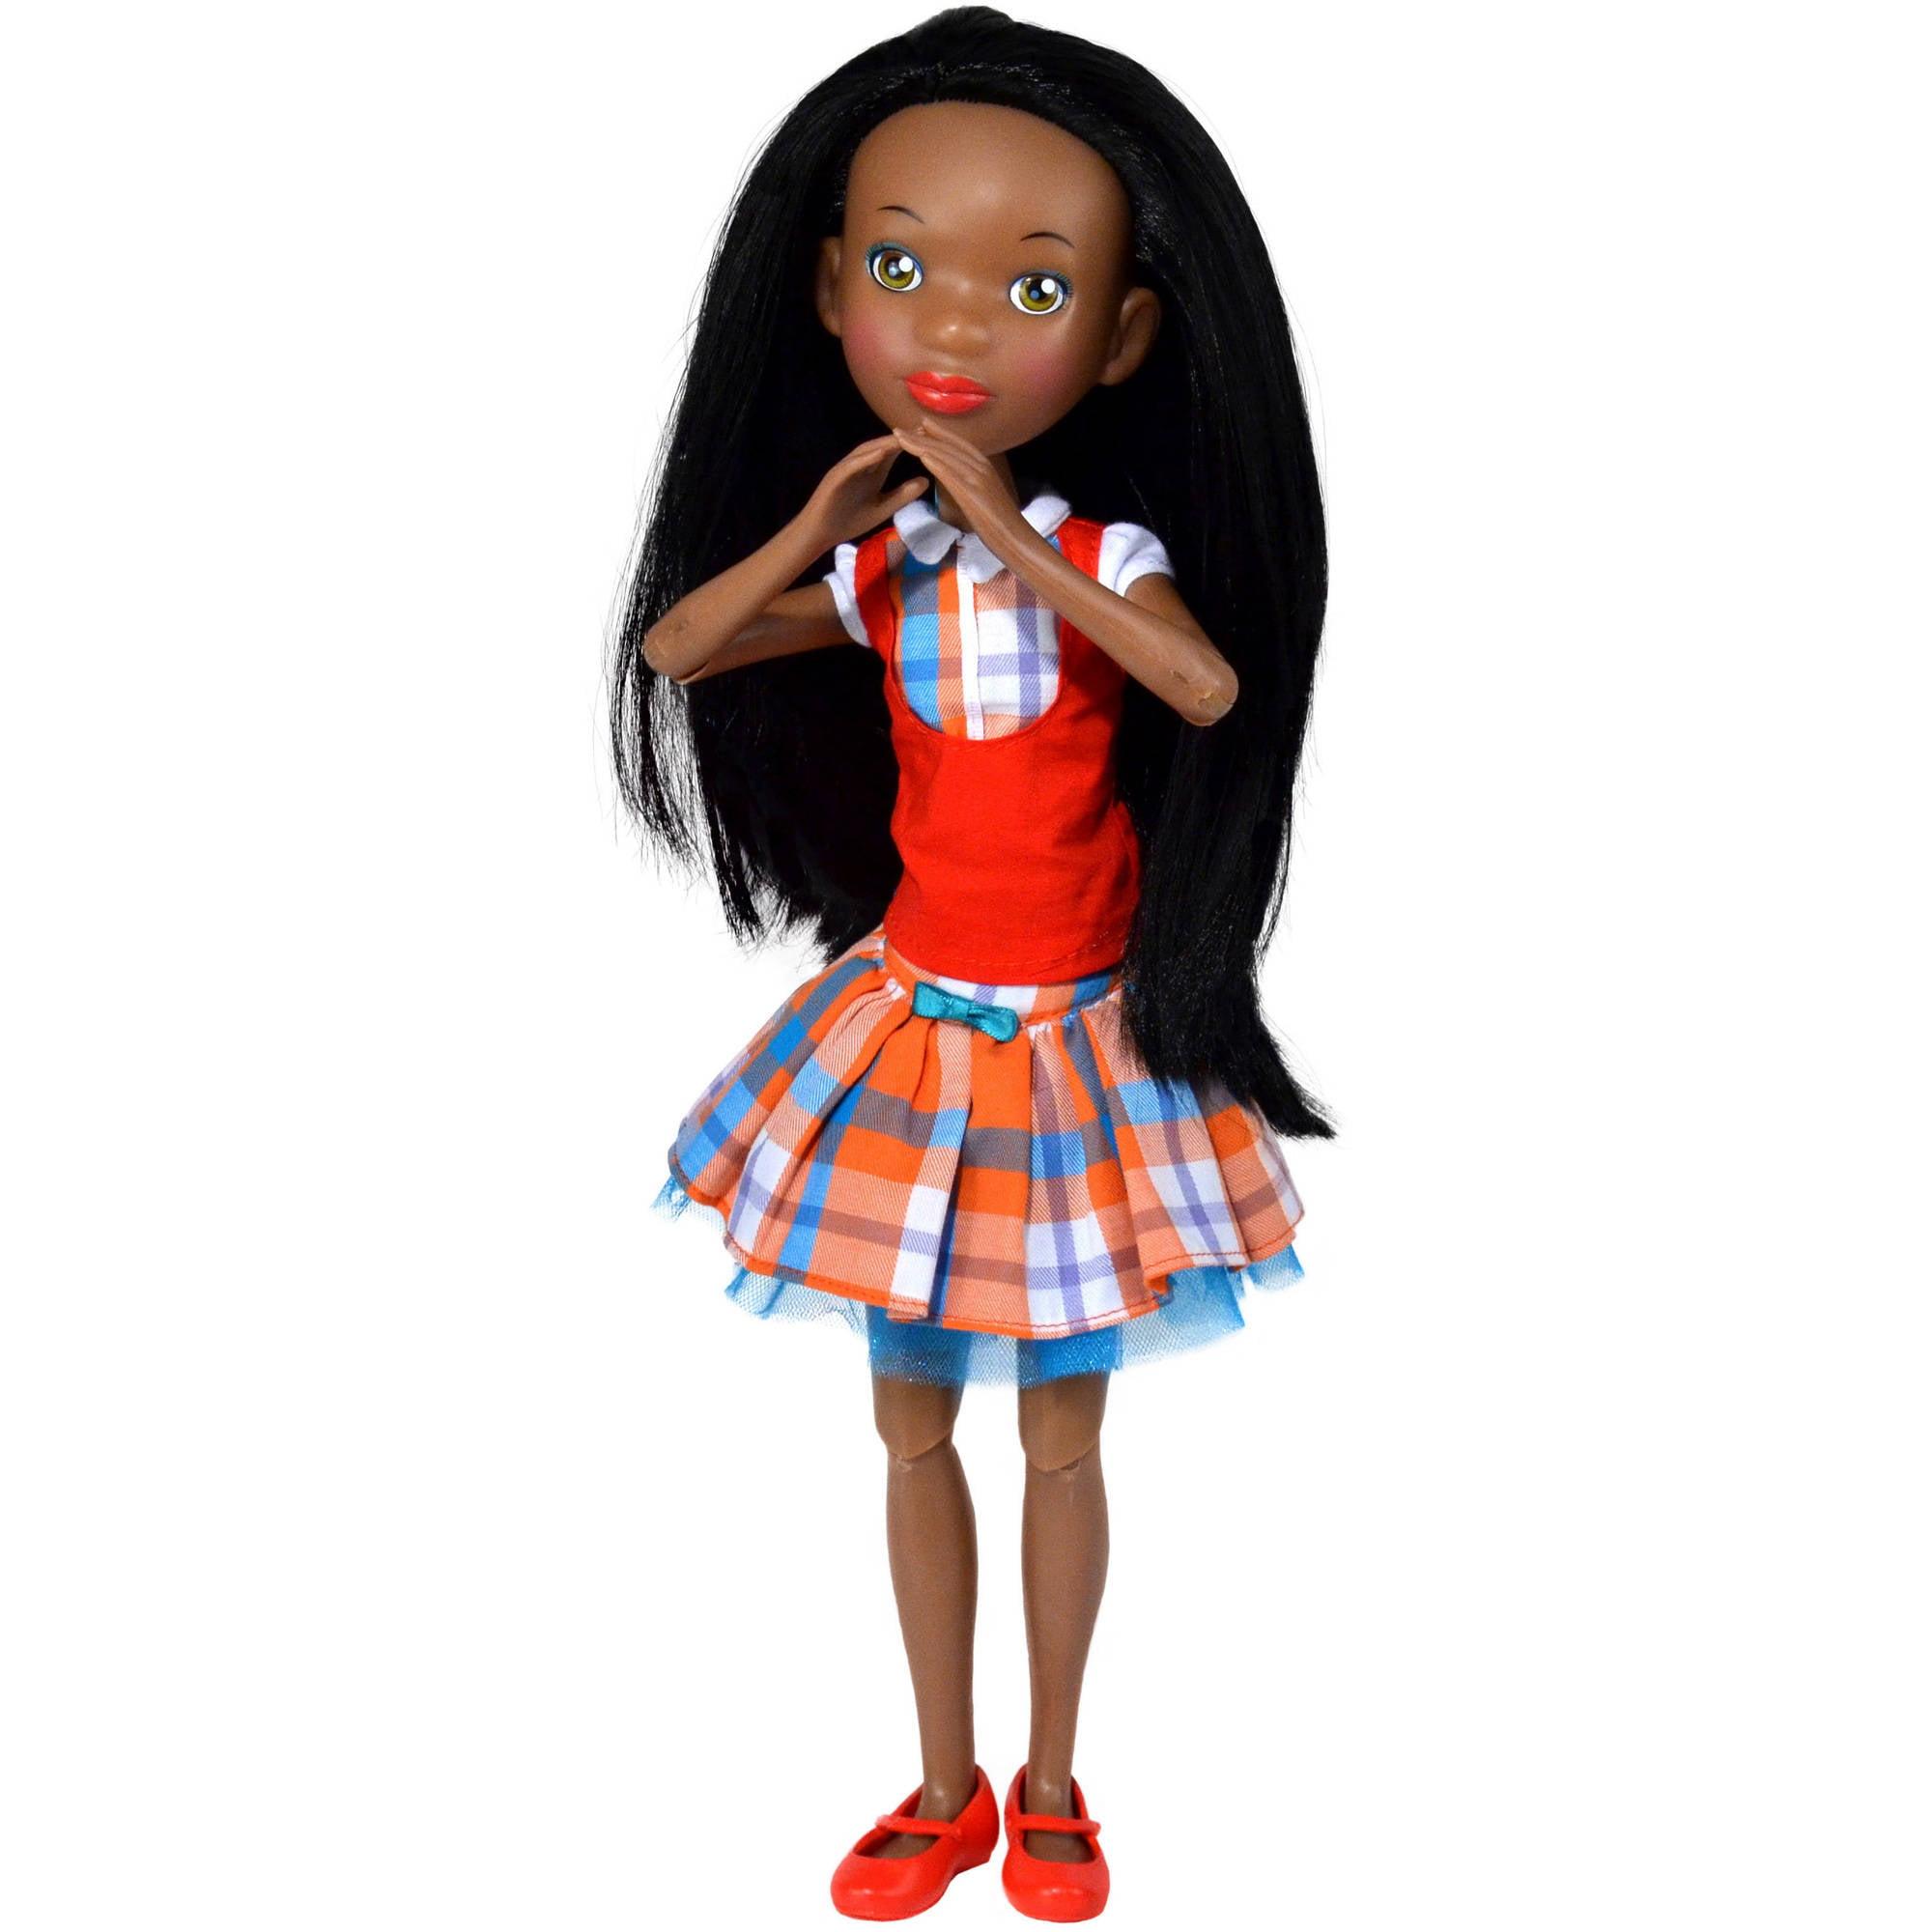 Walmart Dolls For Girls